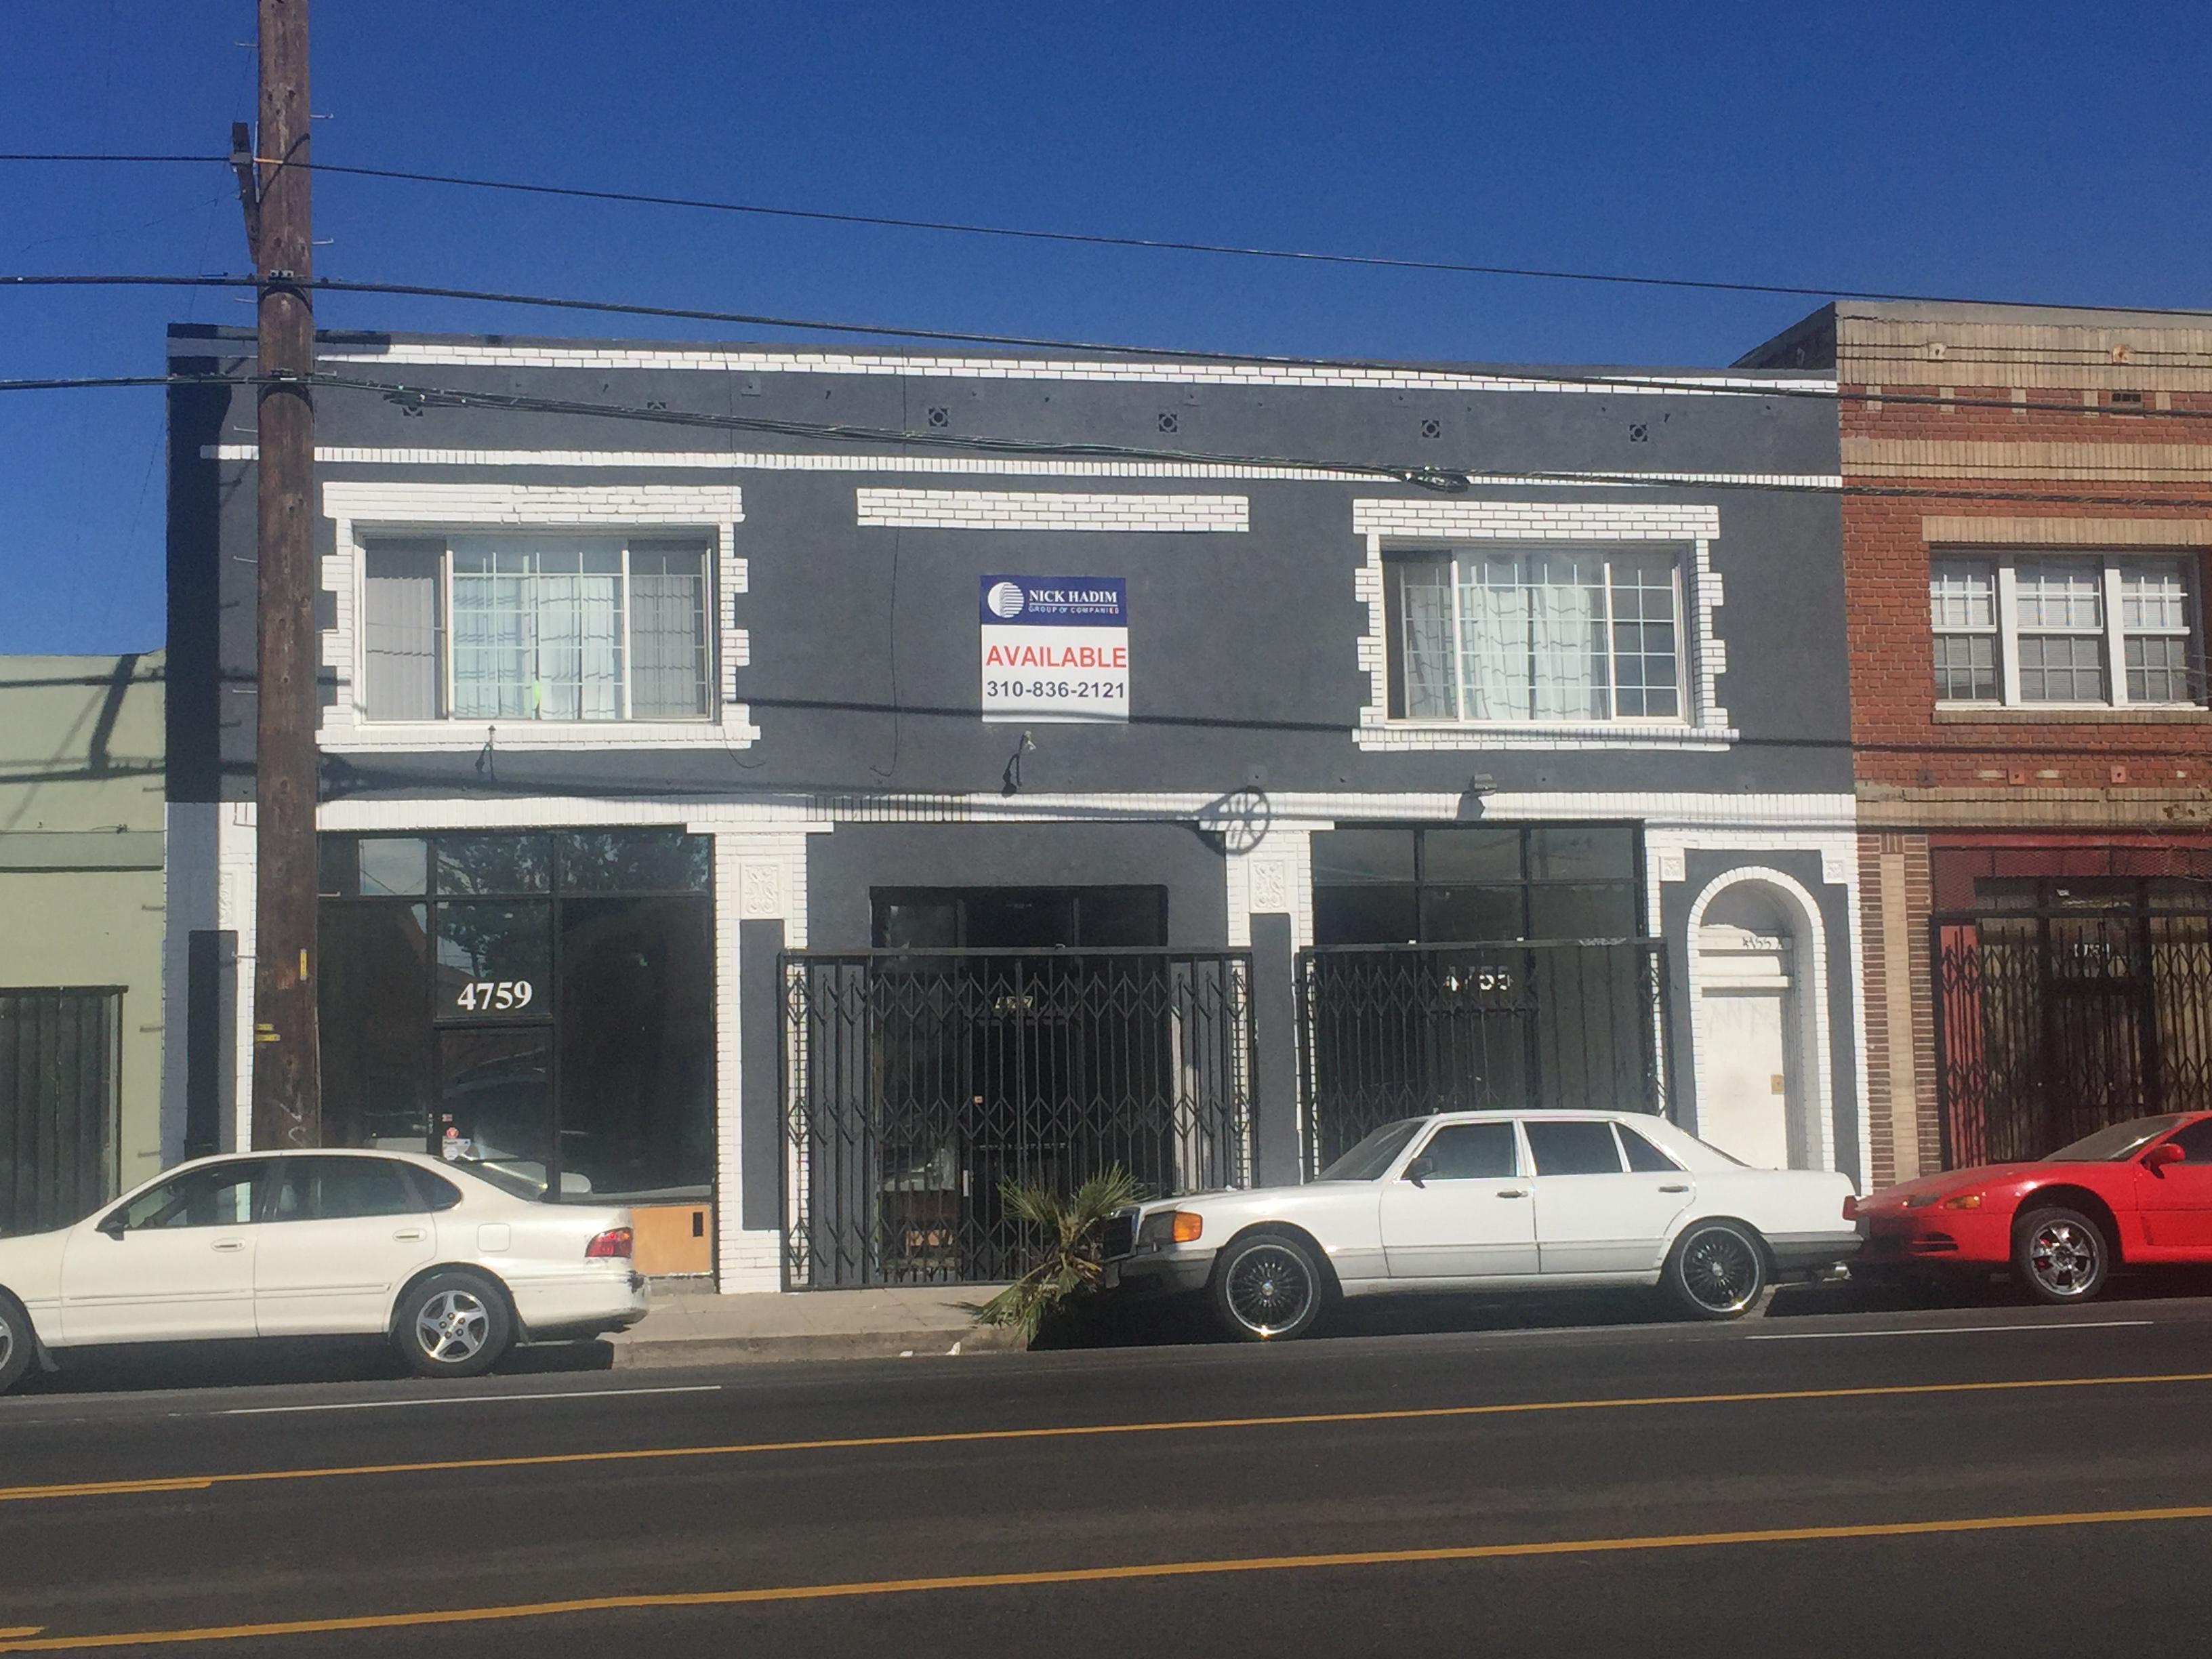 4757 W. Adams Blvd